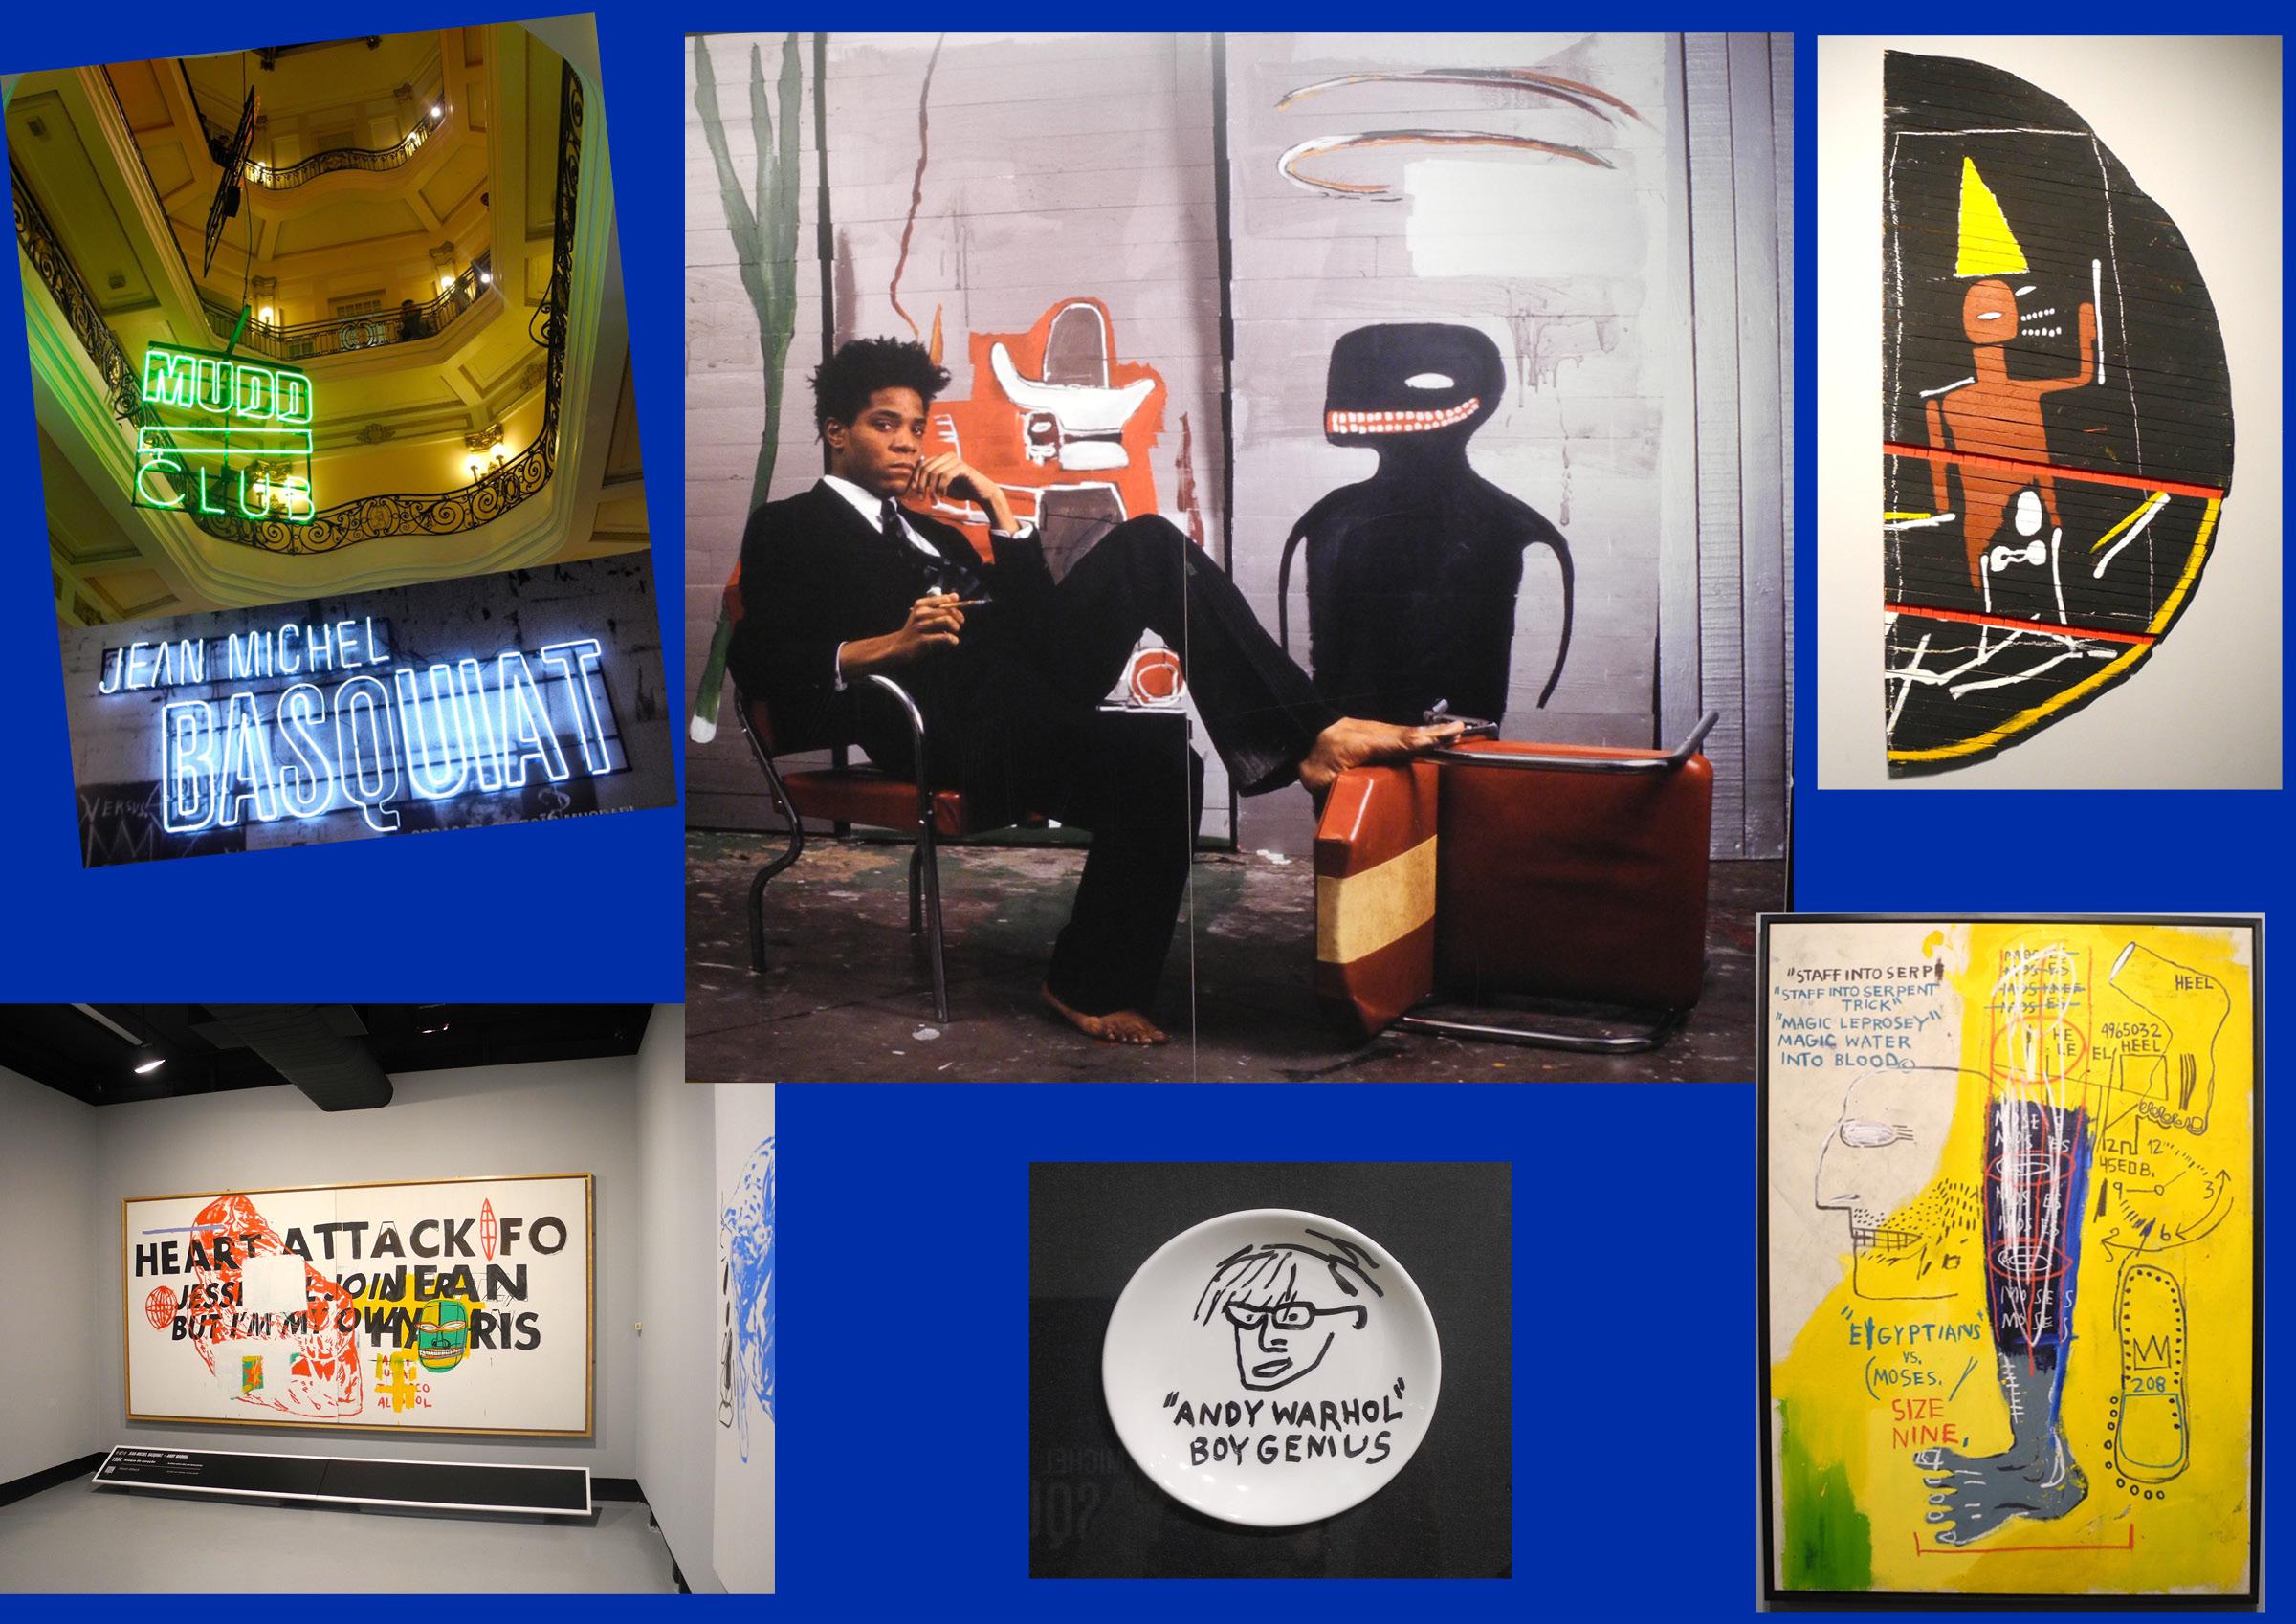 Jean-Michel Basquiat Exhibition, CCBB São Paulo, 2018, photos Alexander Moers